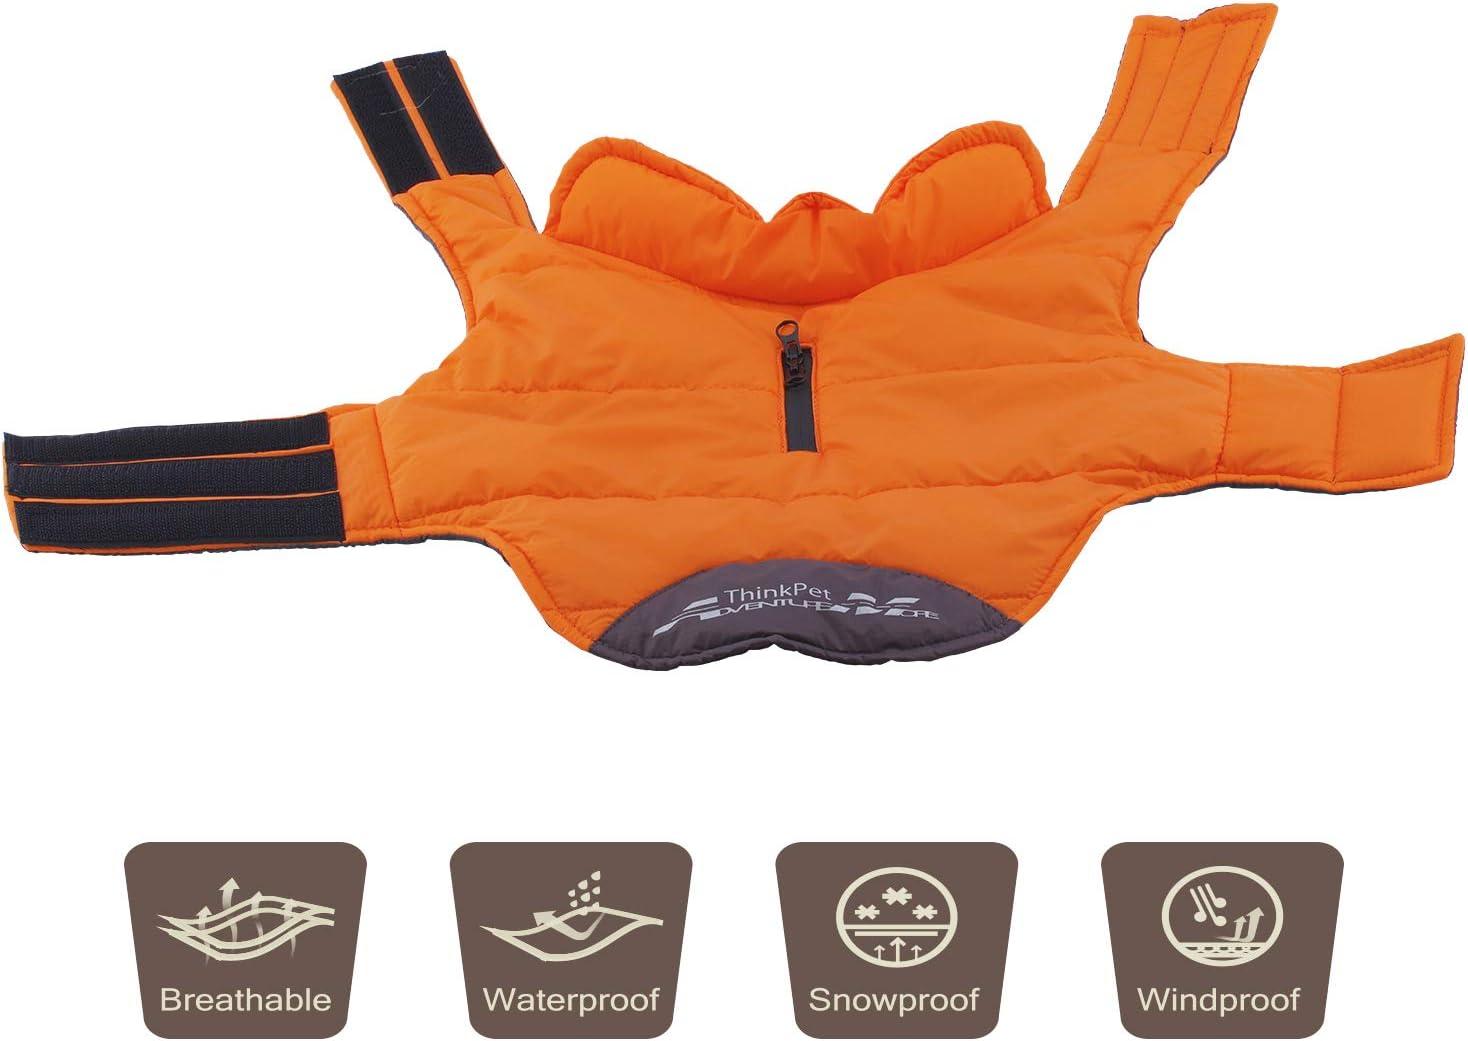 ThinkPet Soft Touch Waterproof Jacket Highly Visible Reflective Dog Vest XXXL Orange Warm Winter Dog Coat